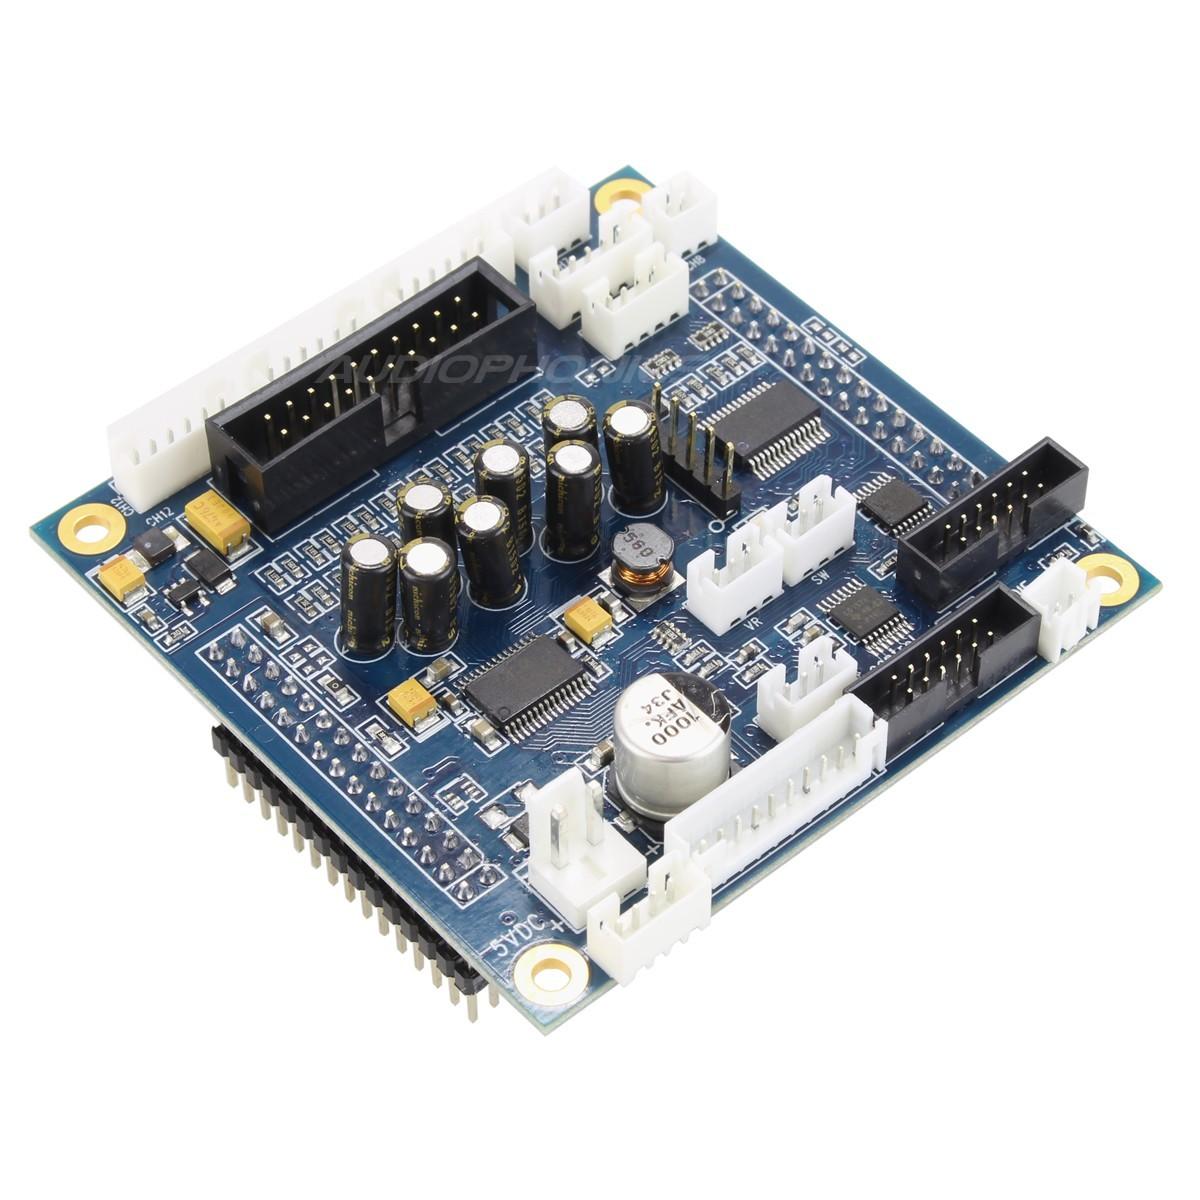 MiniDSP miniDAC8 Interface / DAC I2S 8 canaux 24bit AK4440 version miniSHARK